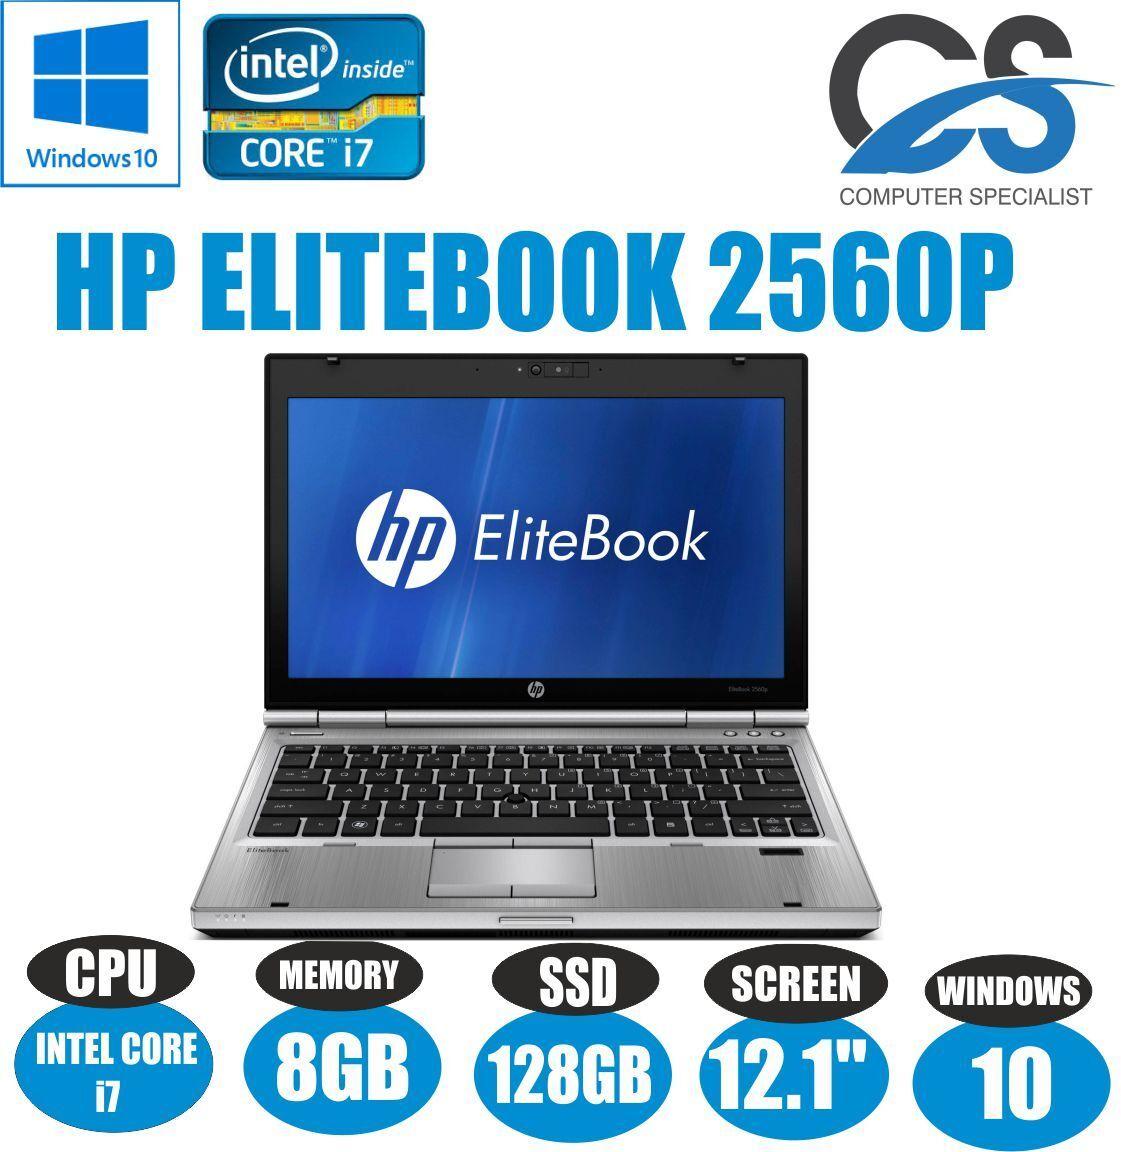 "hp elitebook 2560p 12.1"" laptop intel core i7 2620m 8gb ram 128 ssd"